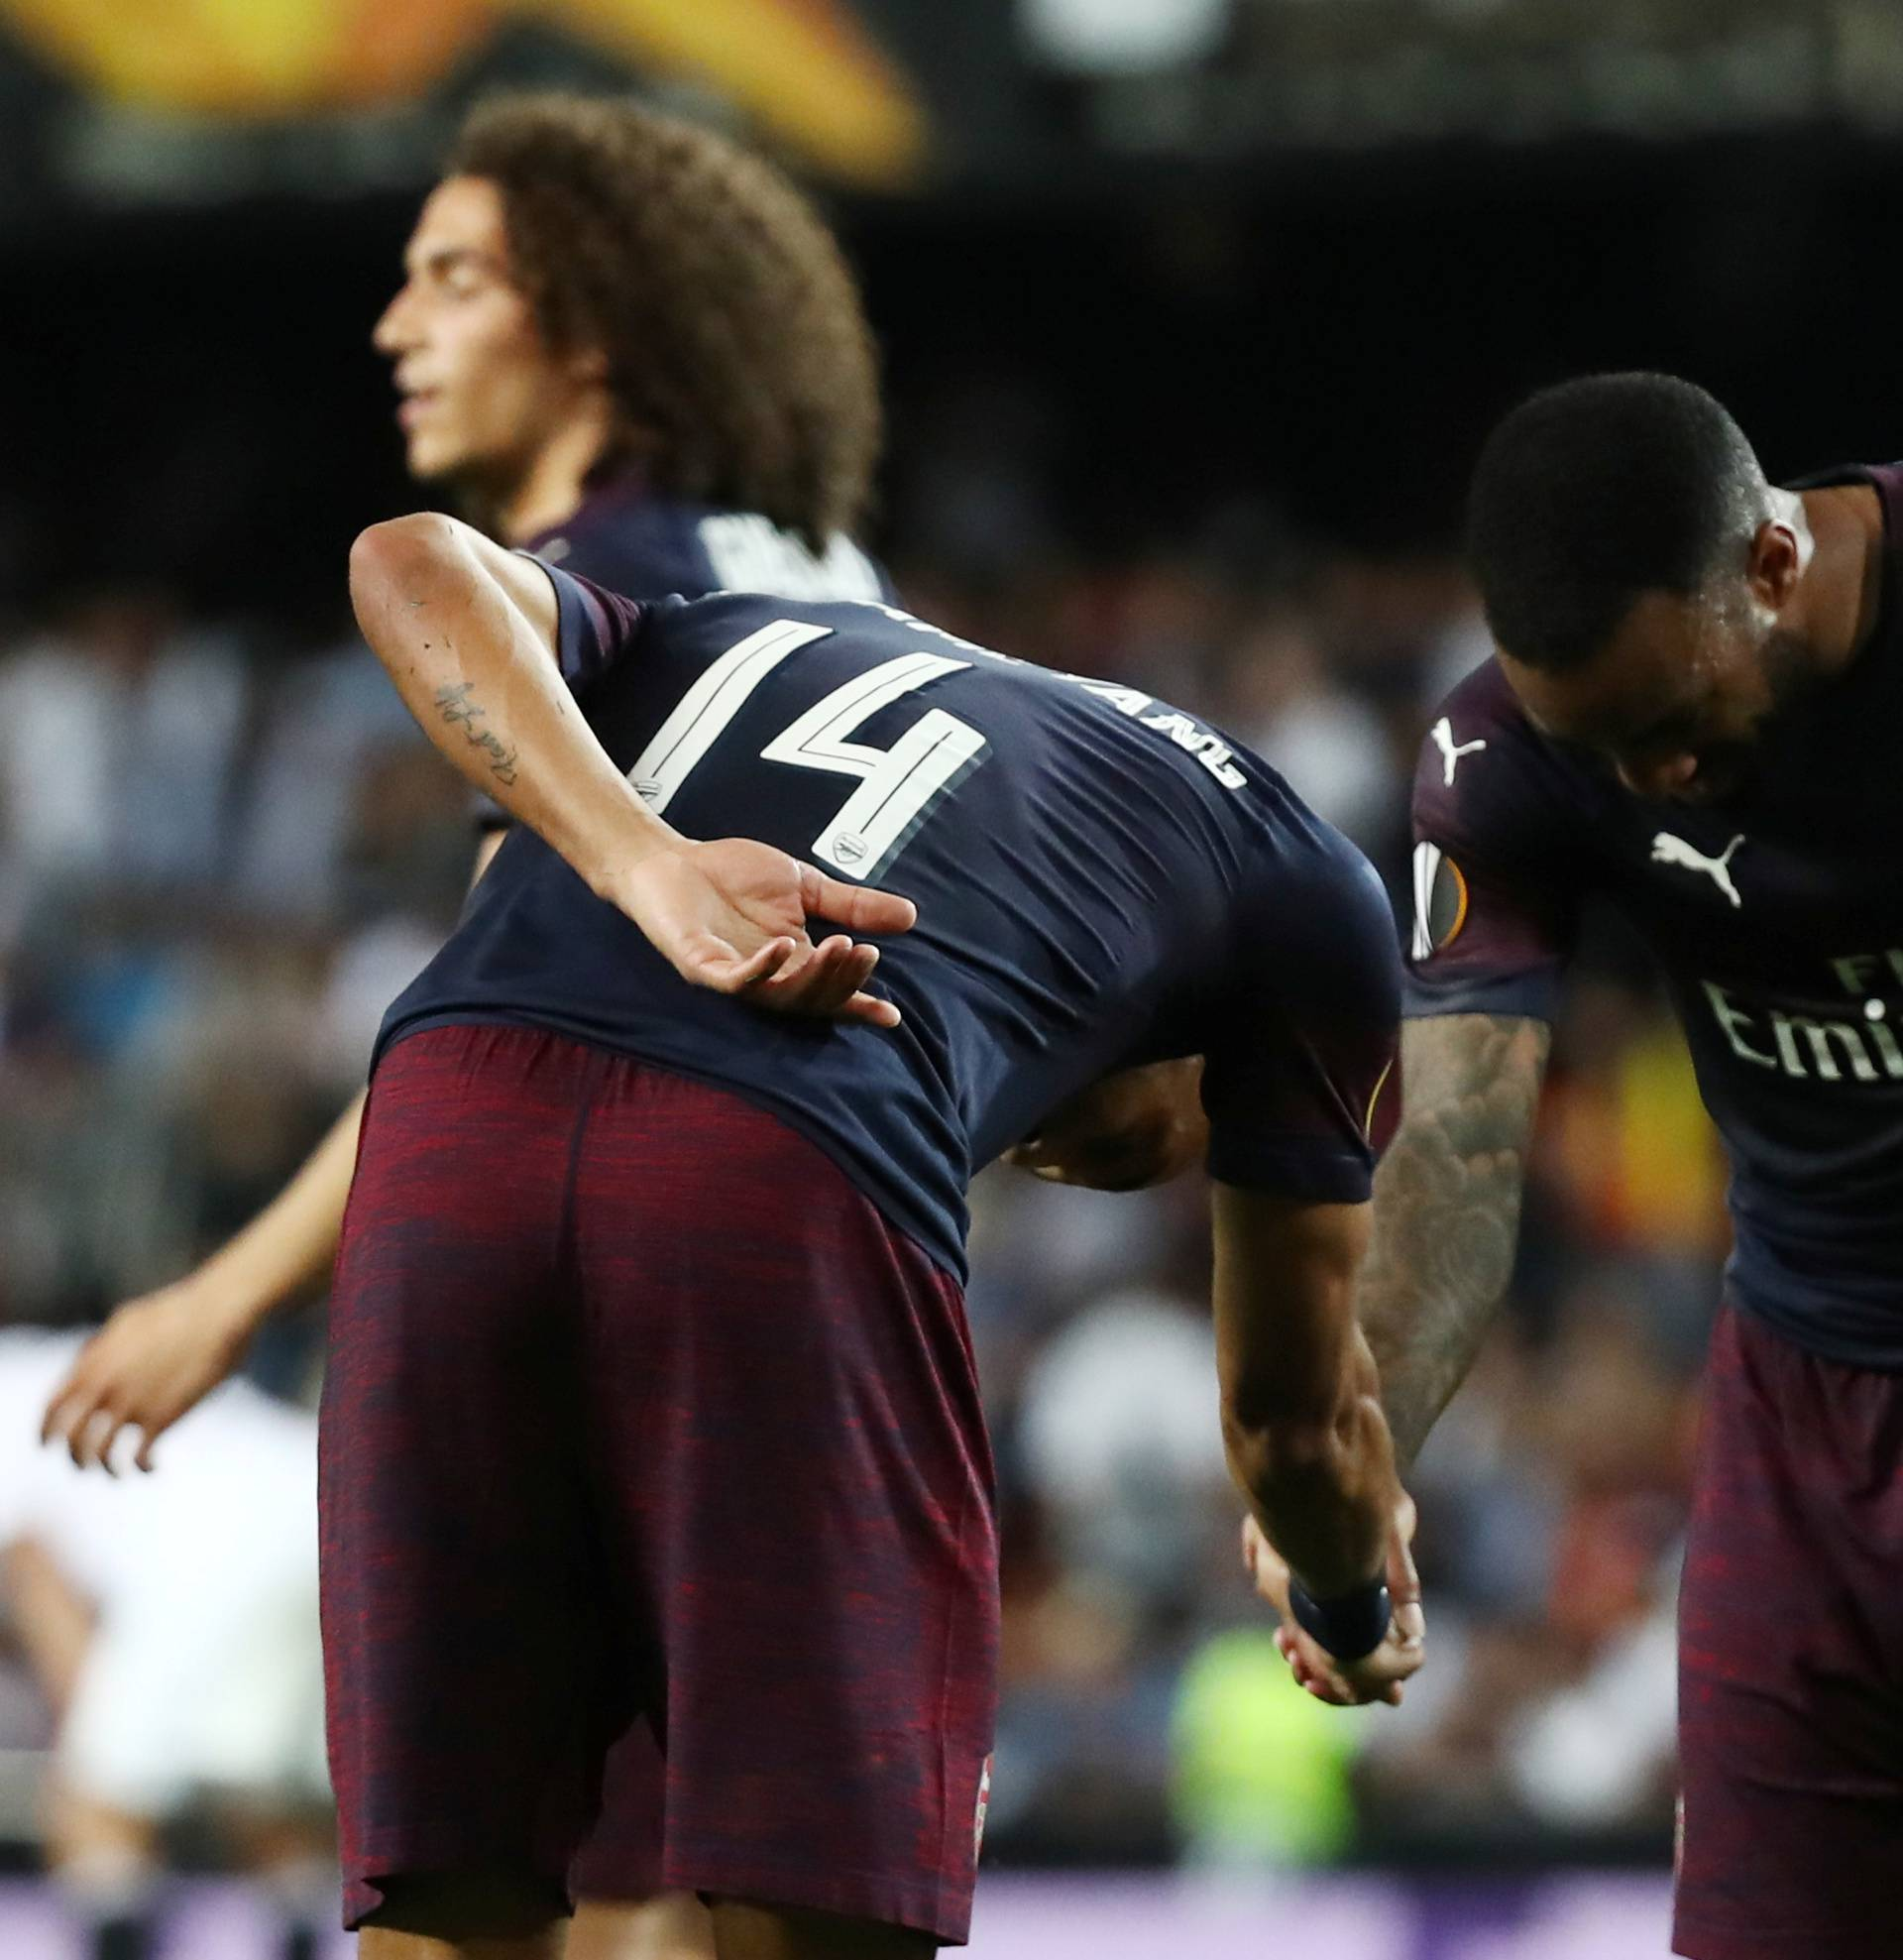 Europa League Semi Final Second Leg - Valencia v Arsenal